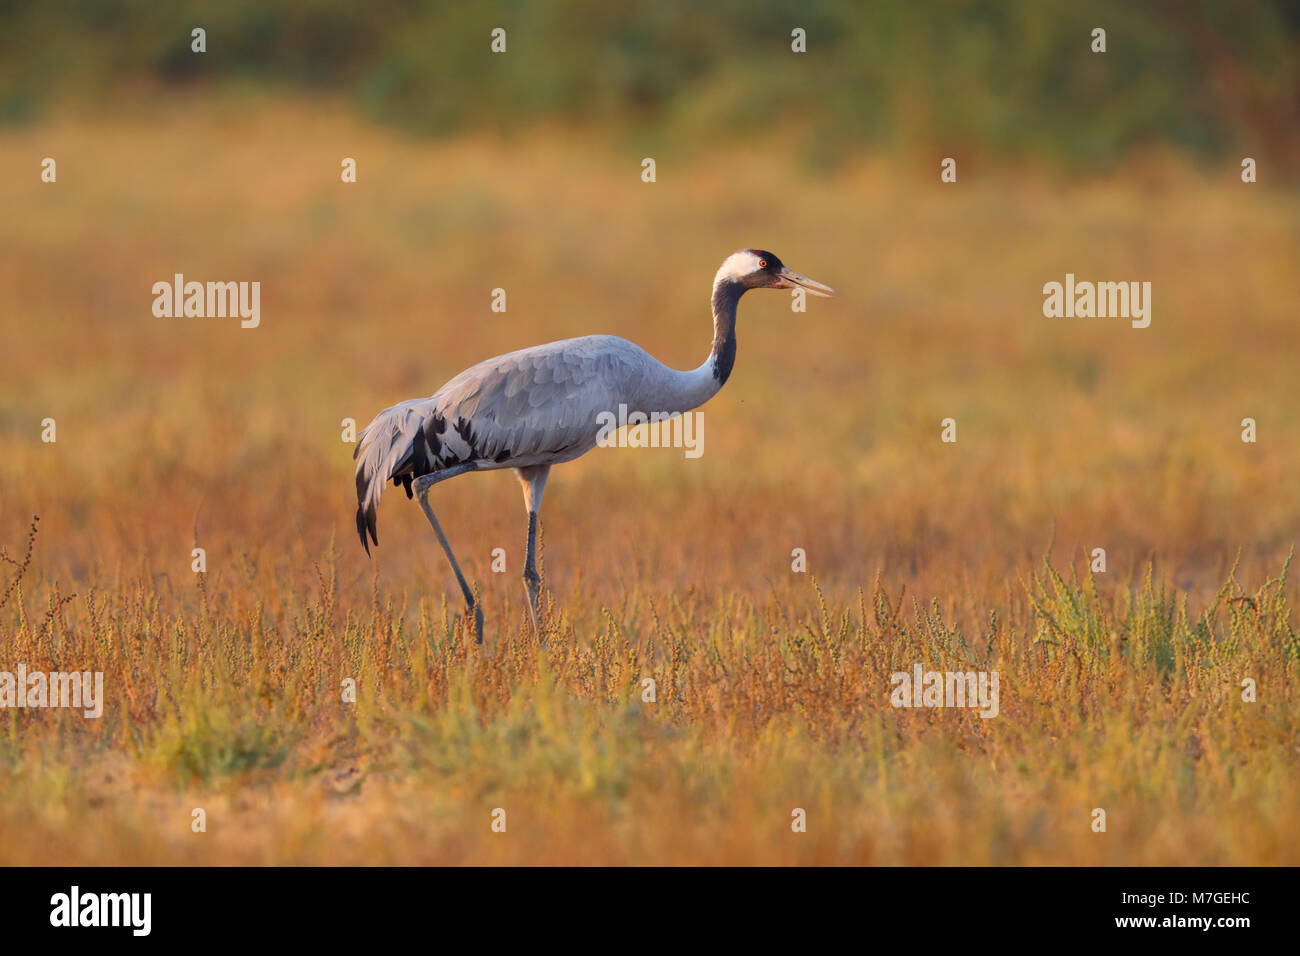 An adult Common or Eurasian Crane (Grus grus) walking across the grassland of the Little Rann of Kutch, Gujarat, India in golden evening light Stock Photo